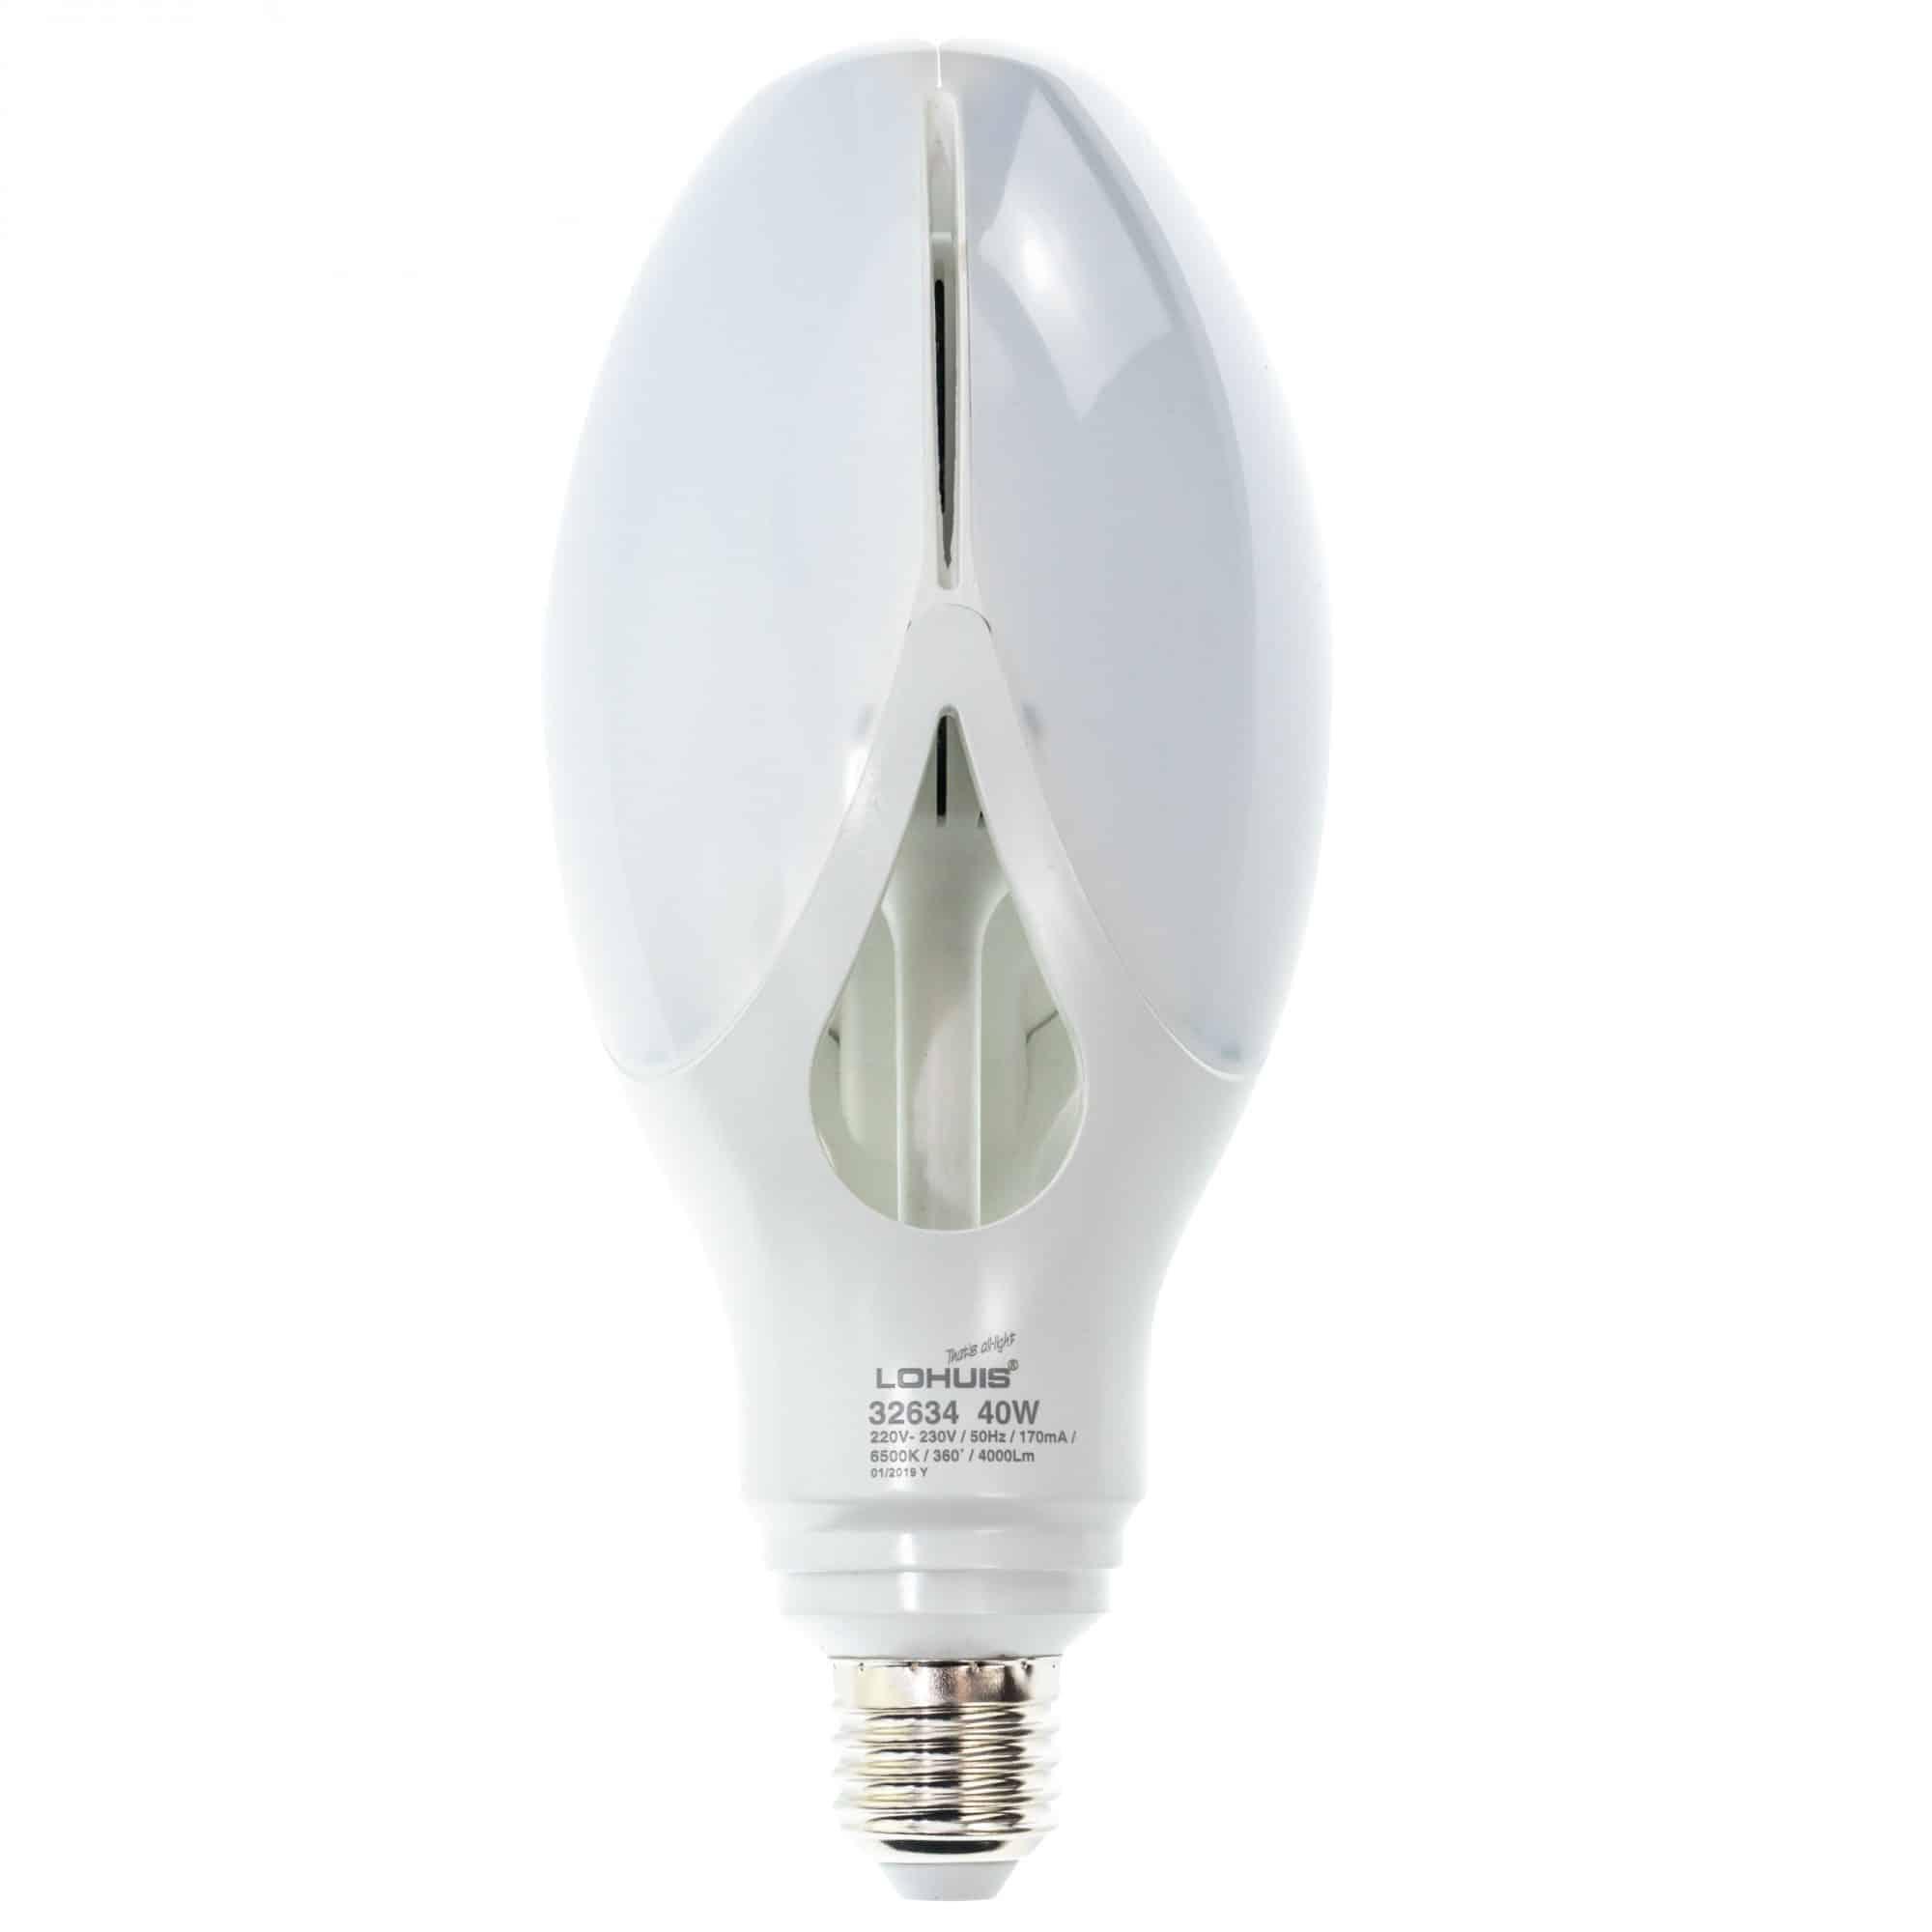 Bec LED Lohuis Flower, E27, 40W, 4000 lm, lumina rece 6500 K mathaus 2021